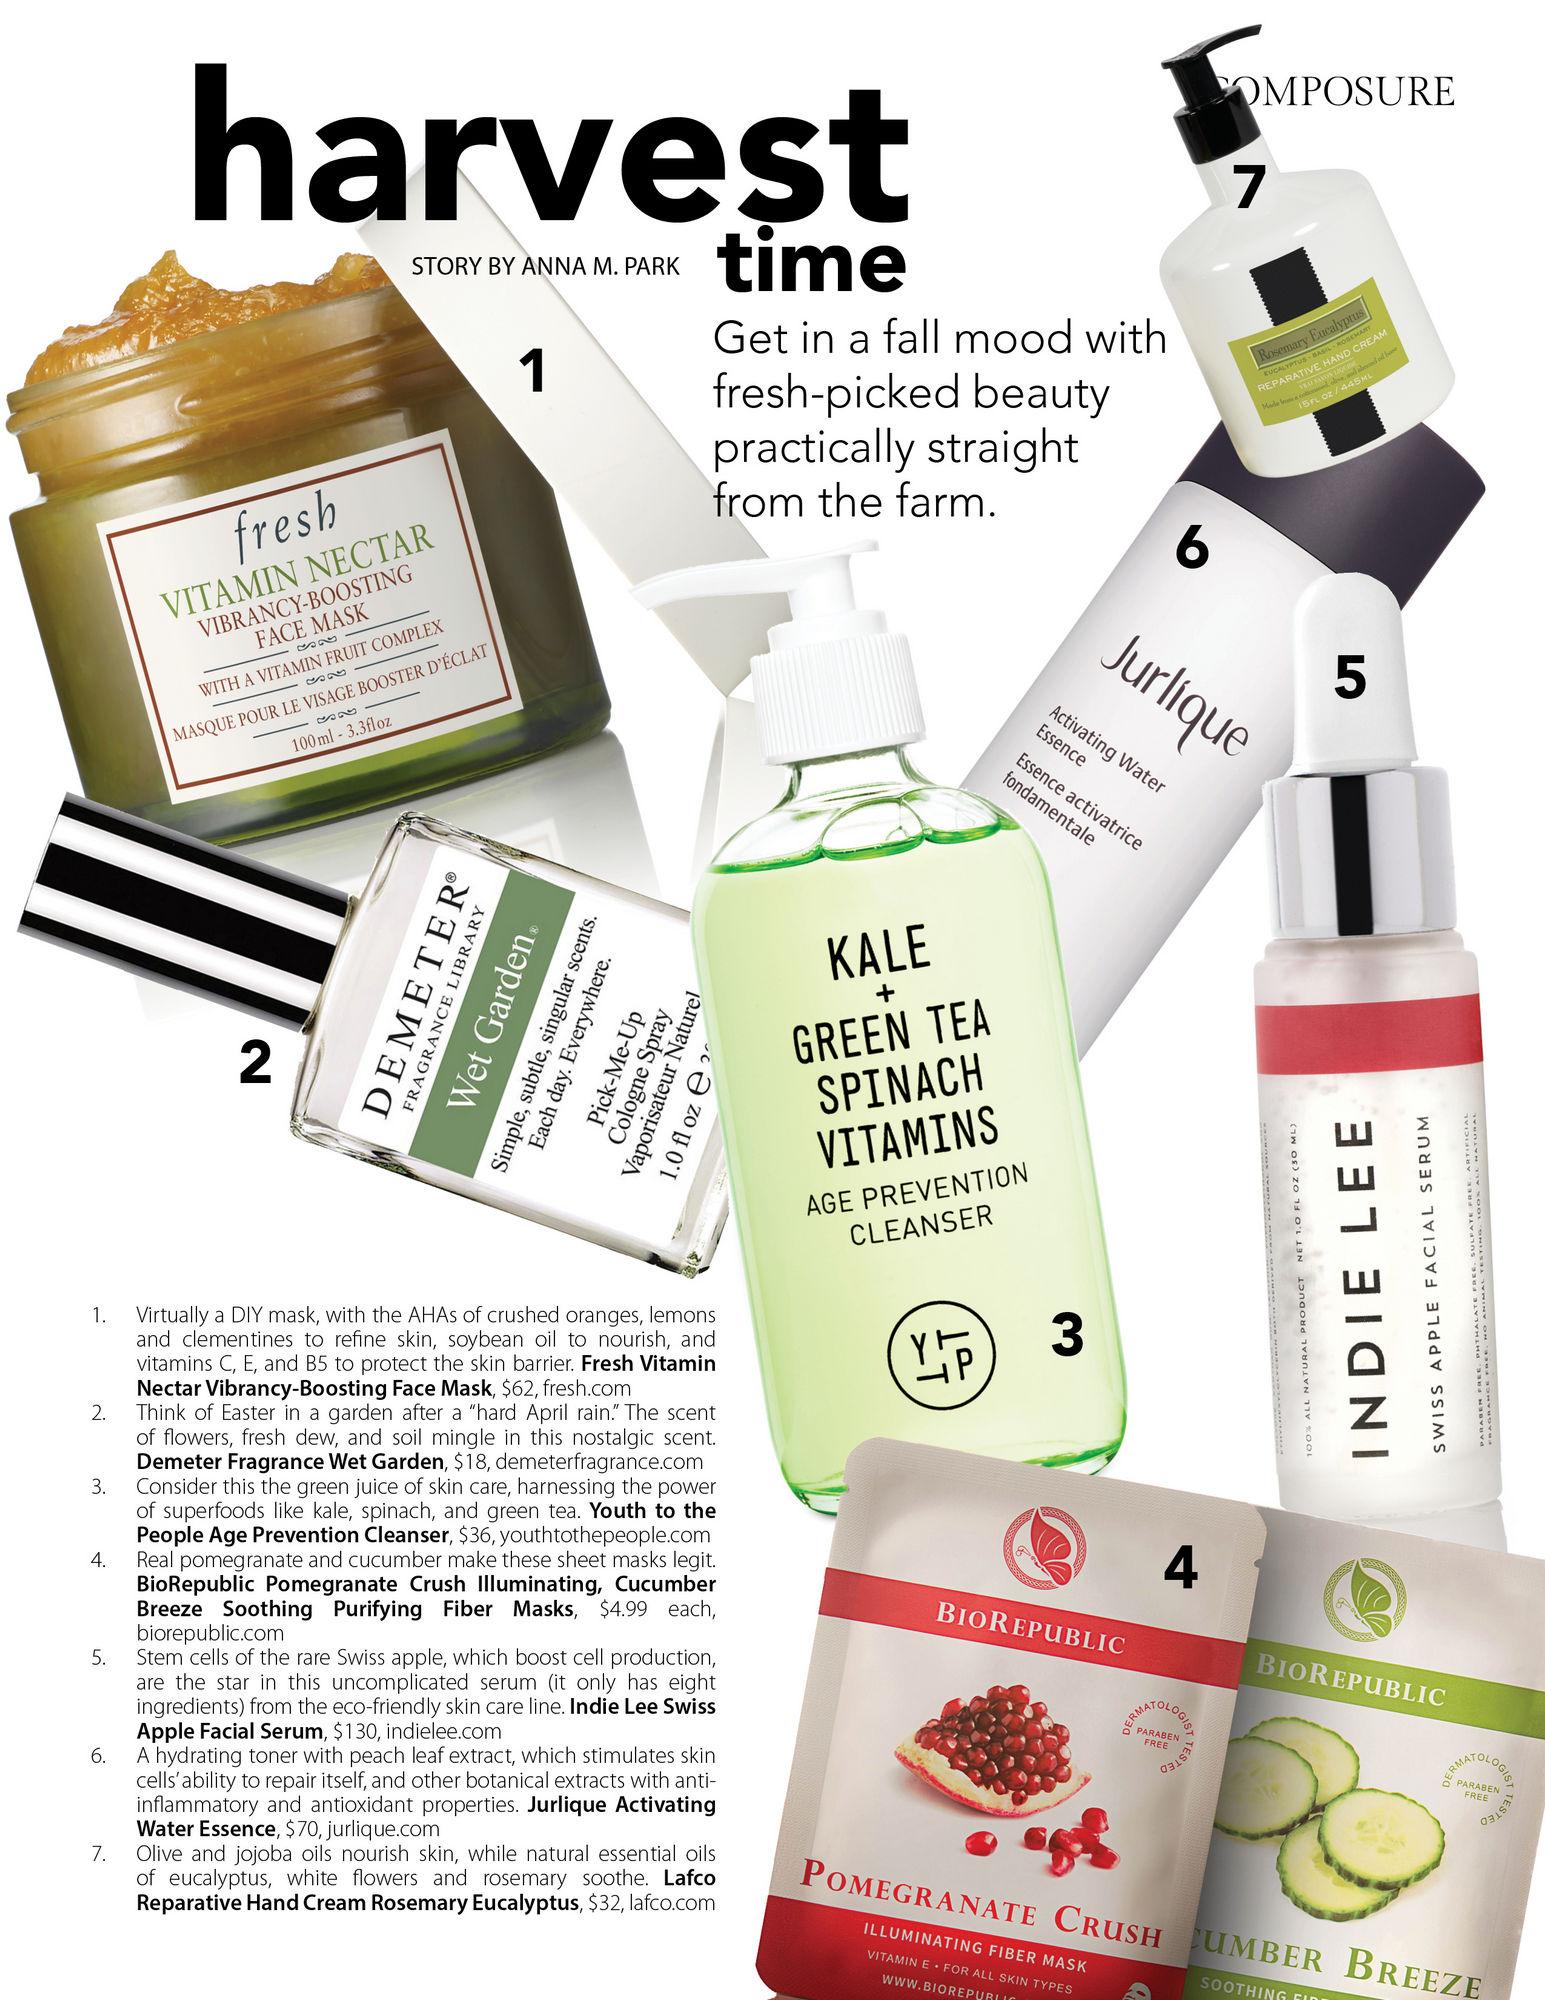 composure magazine harvest time